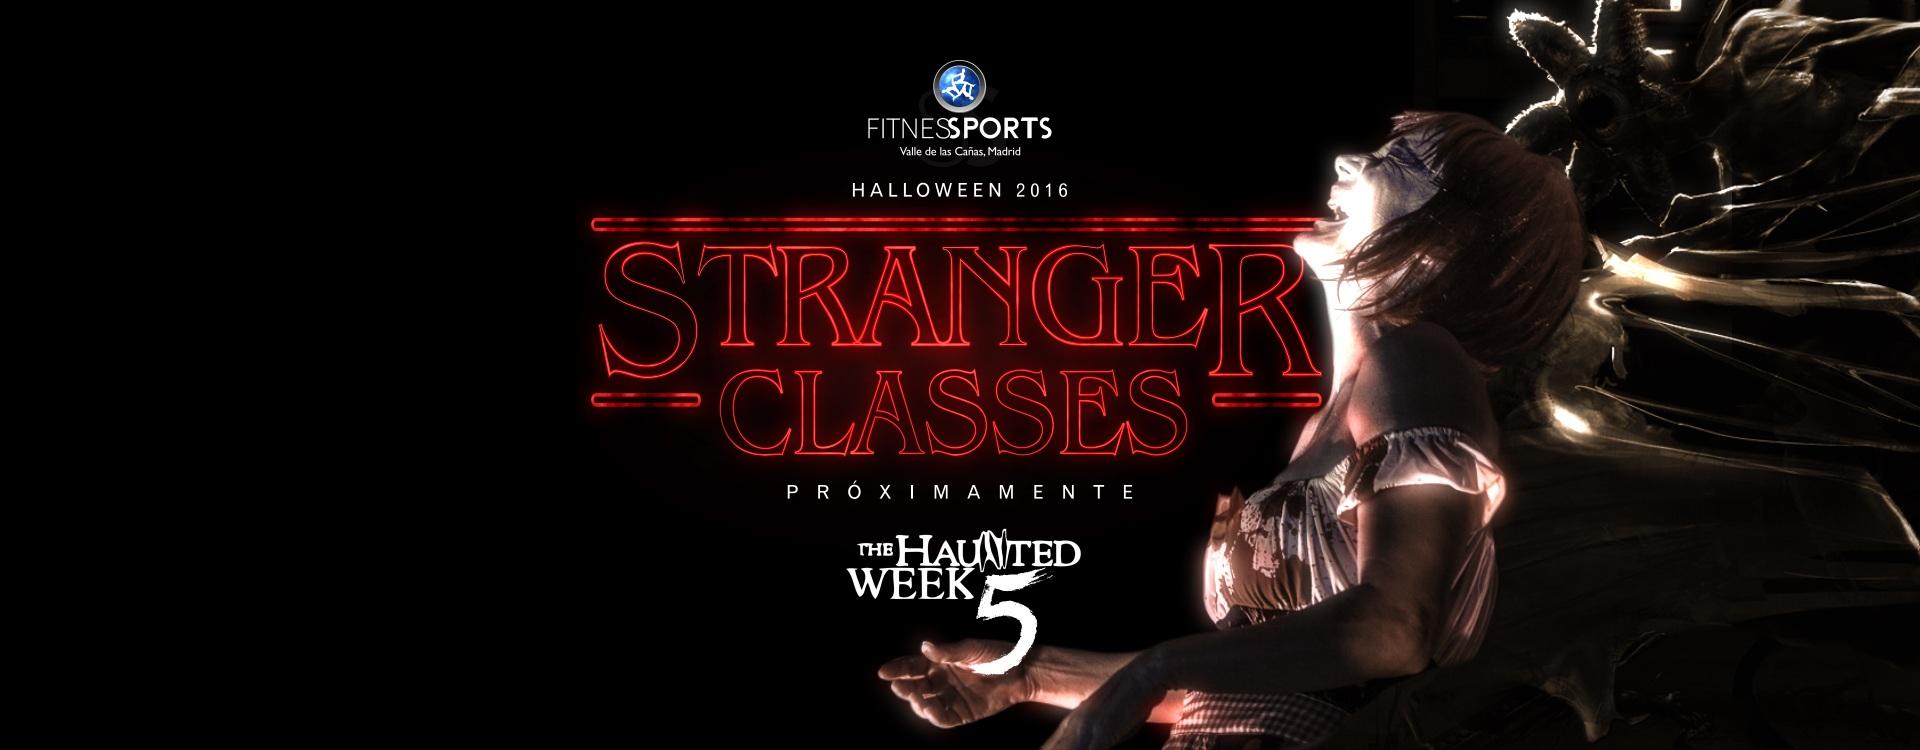 Stranger Things Upside Down Demogorgon Halloween 2016 Haunted Week 5 Fitness Sports Valle las Cañas